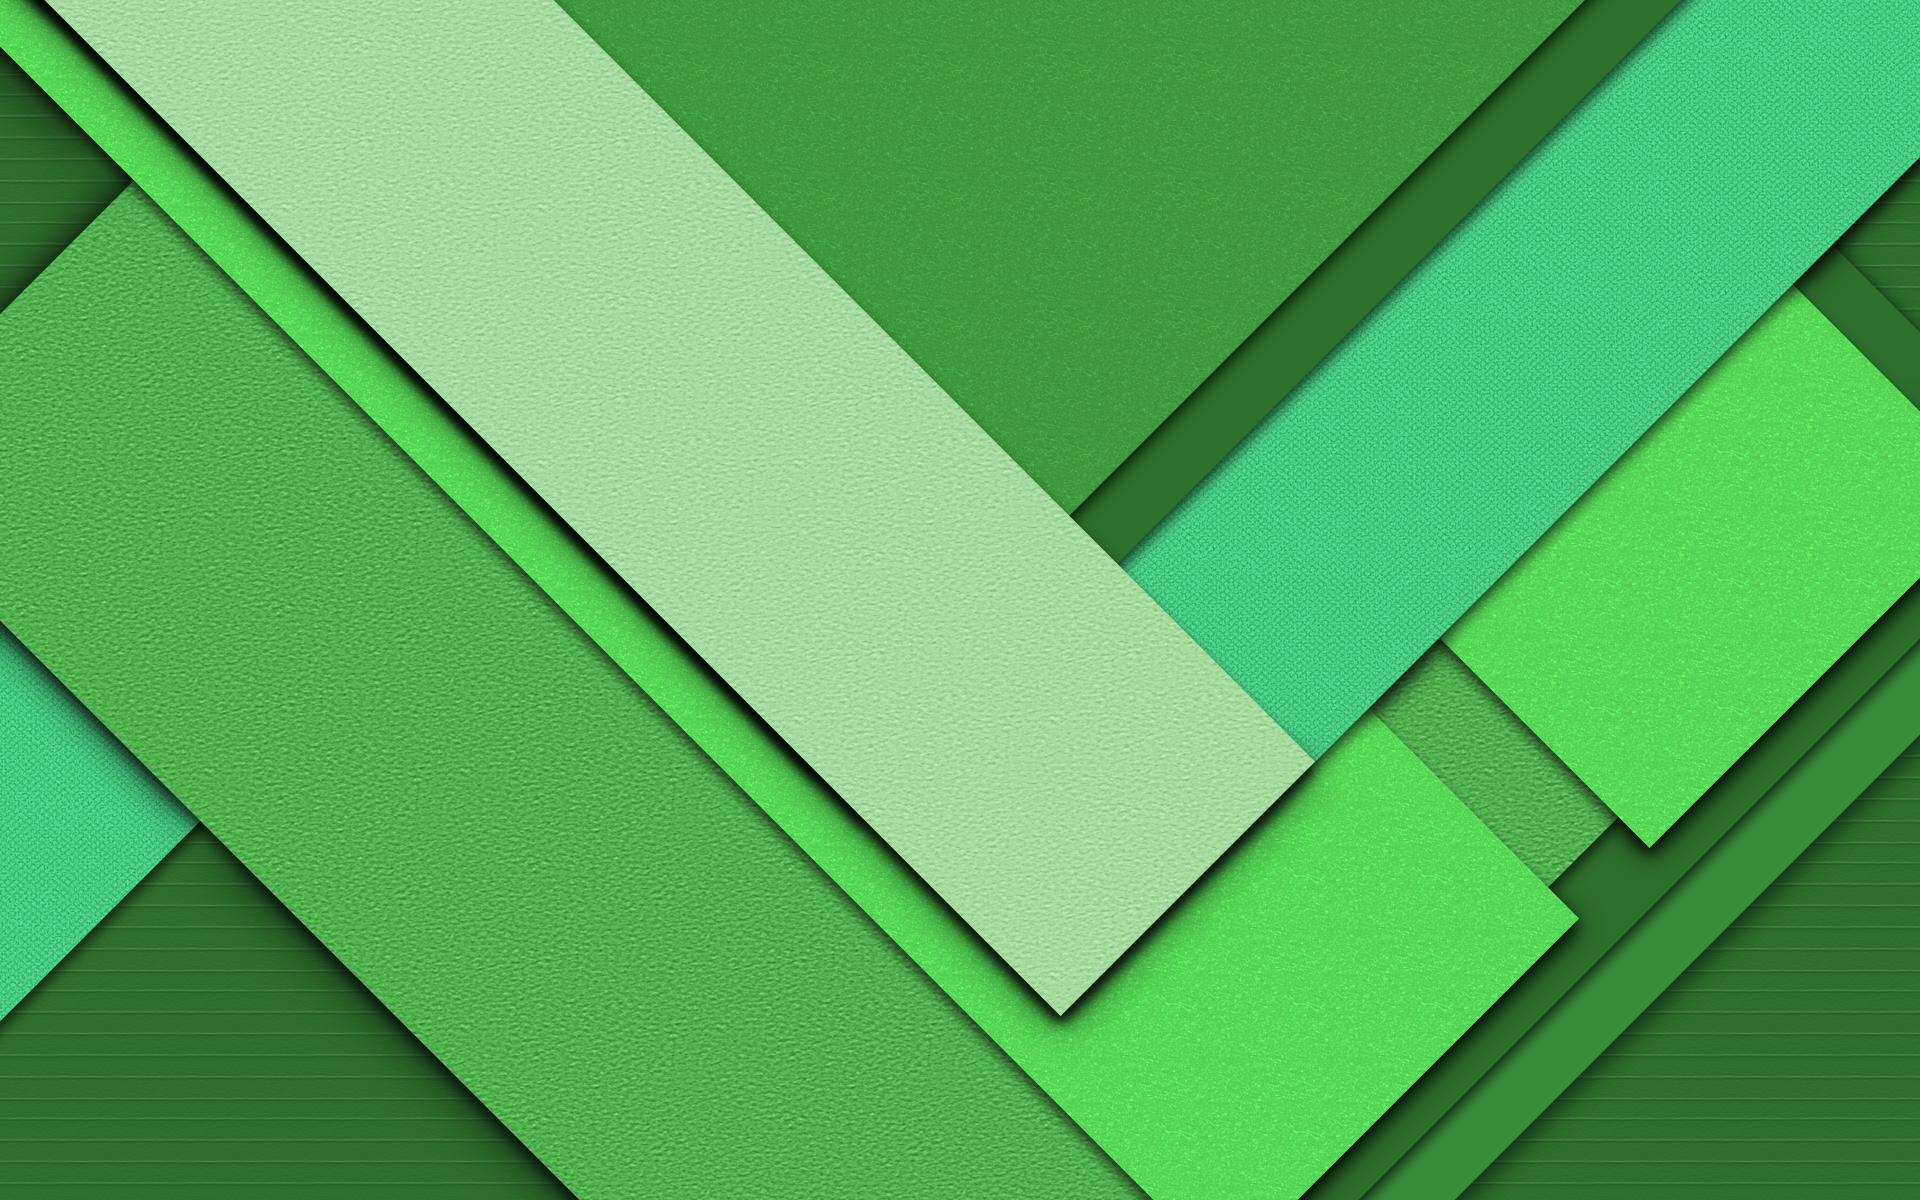 PaperColorMaterialDesign TextureGreen Ethans Blog